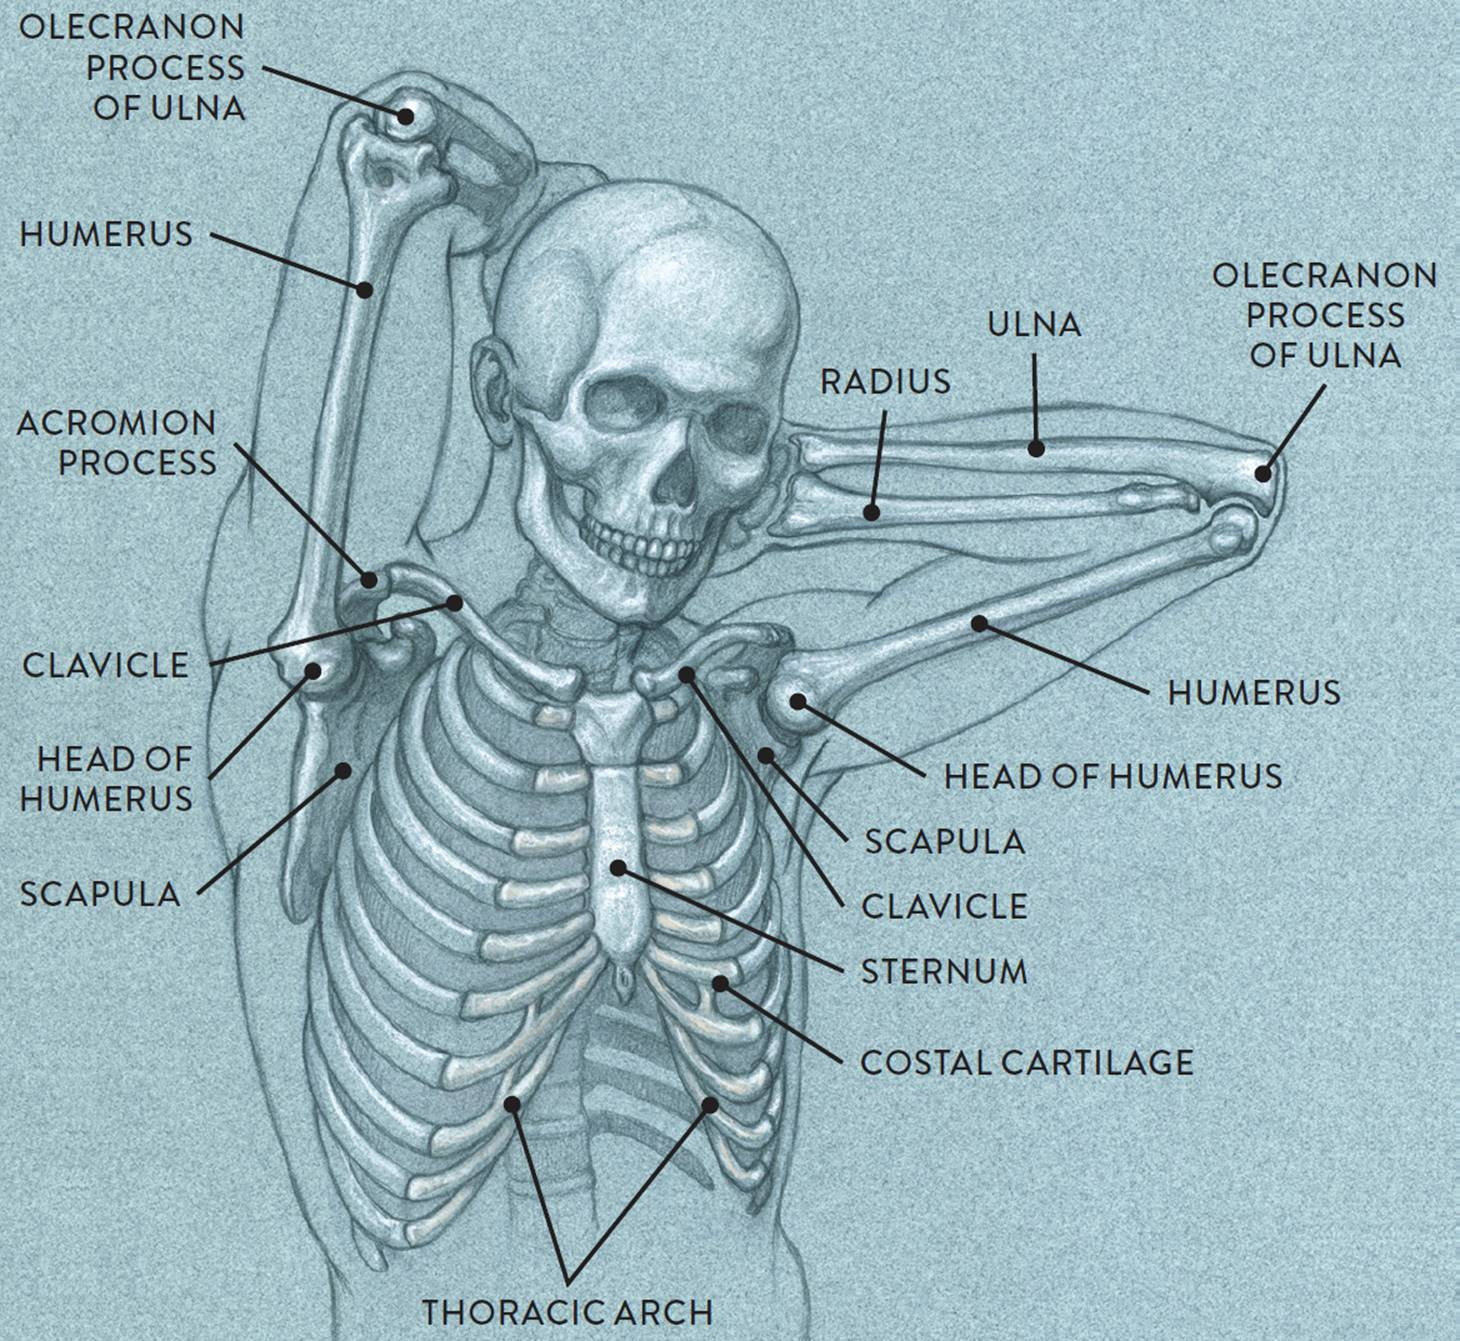 Bones and Surface Landmarks - Classic Human Anatomy in